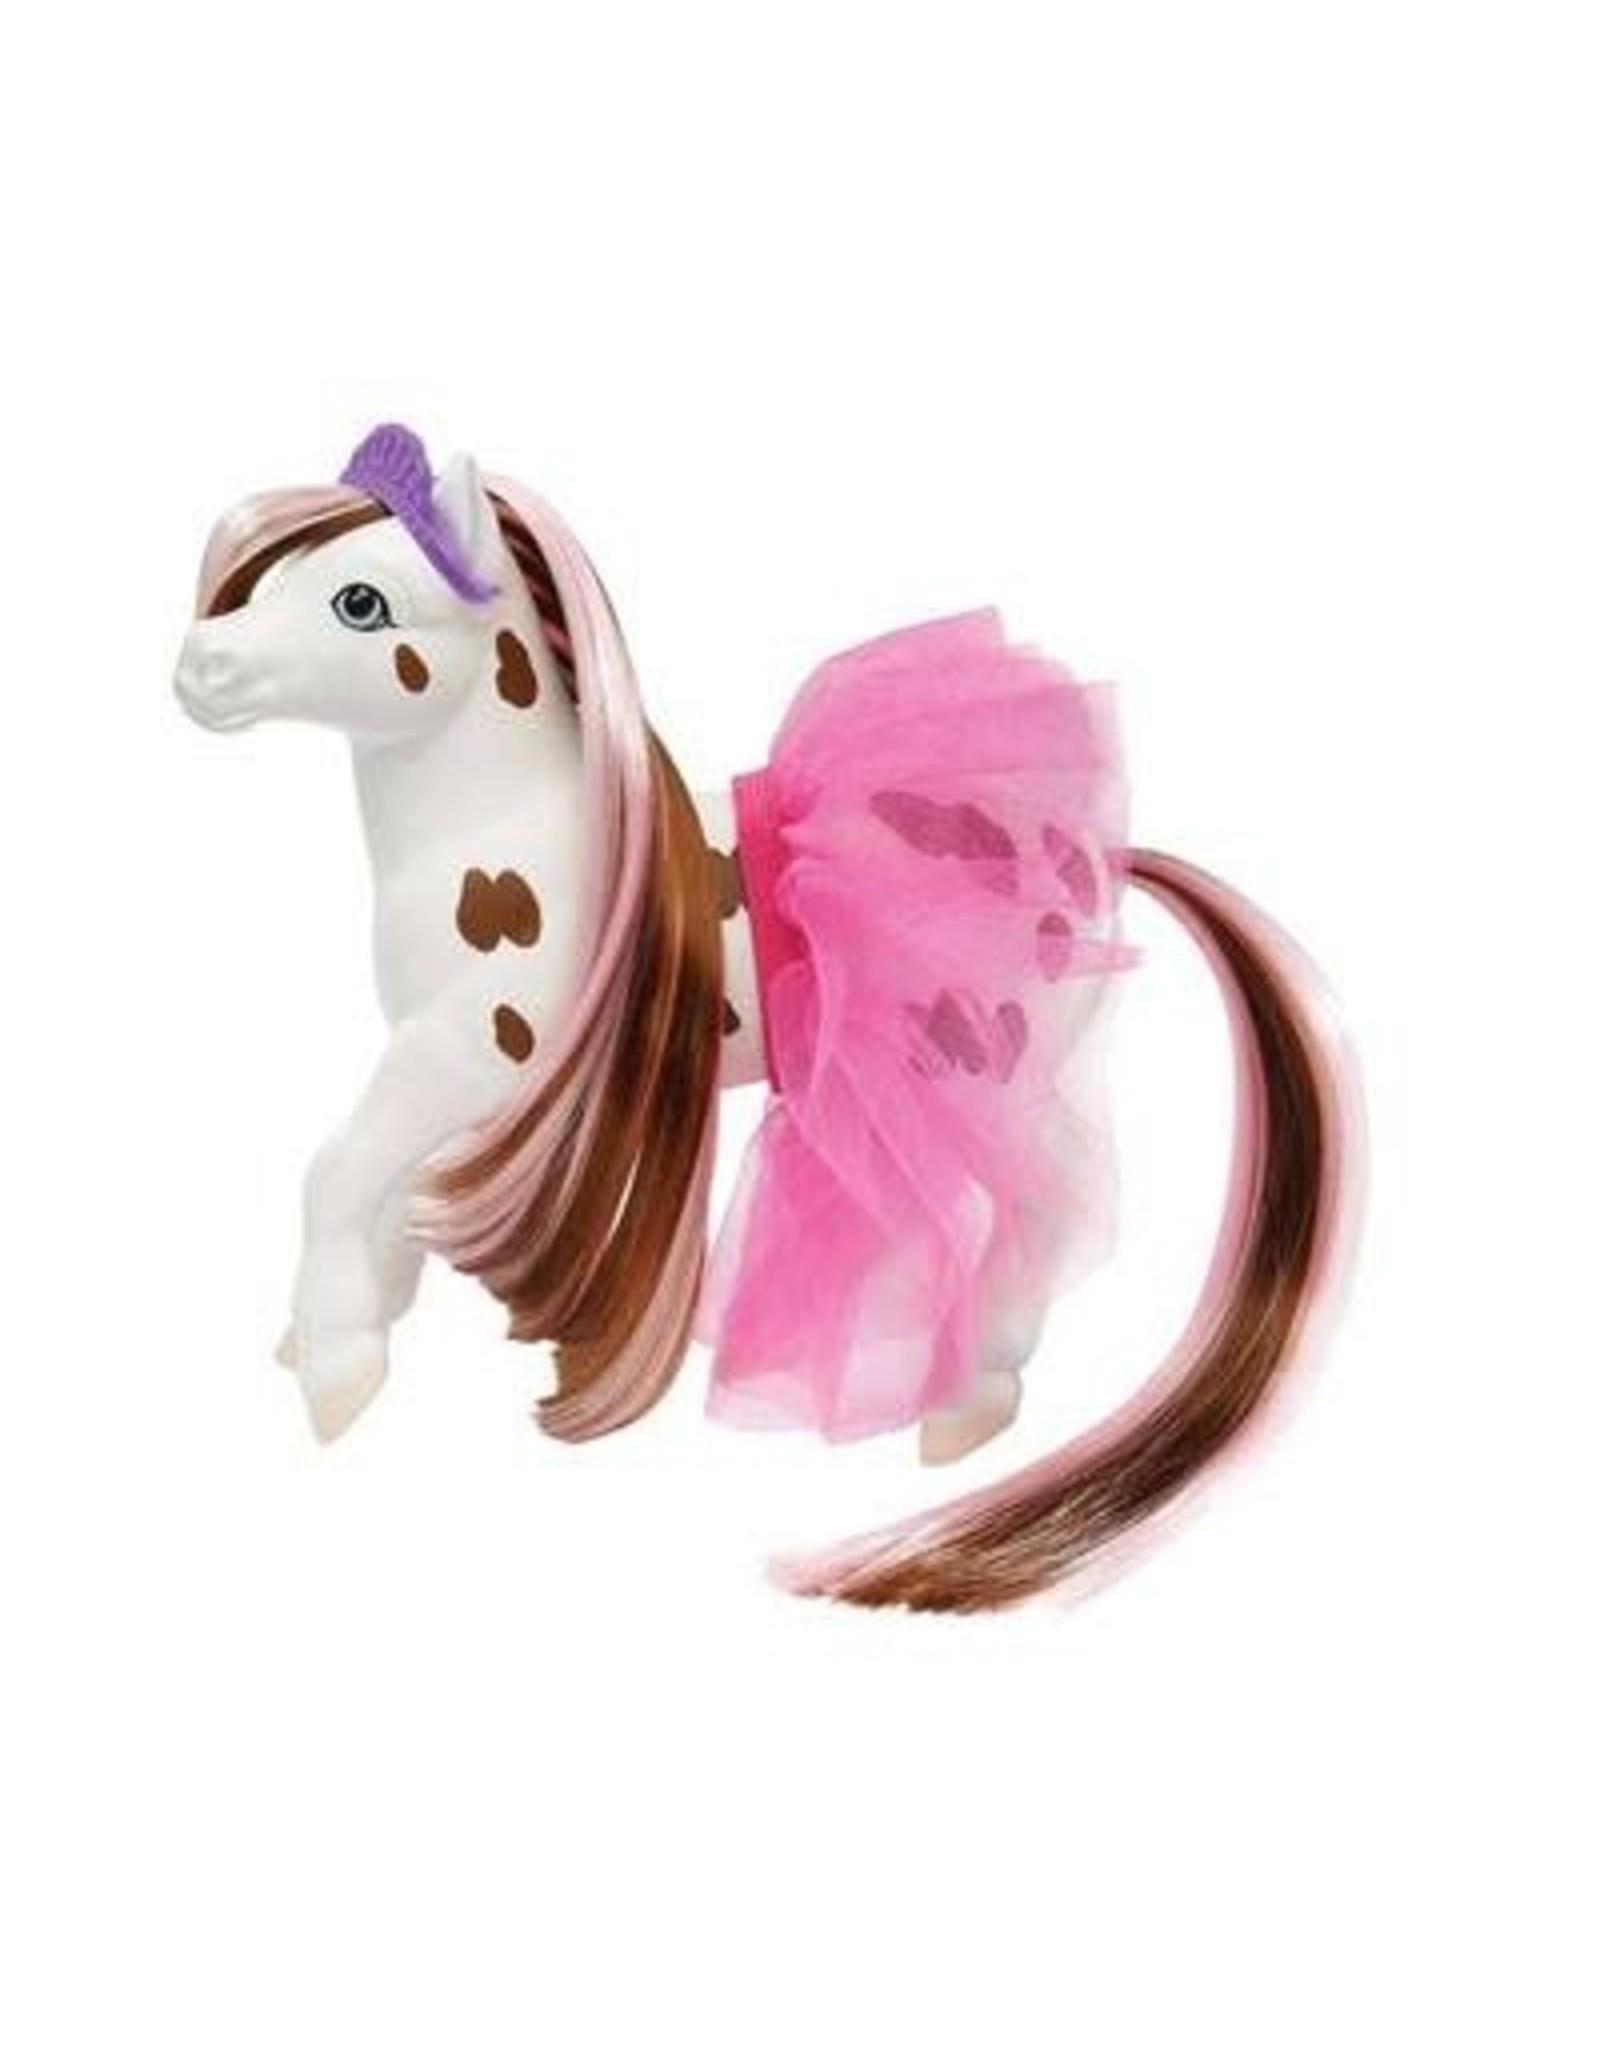 Breyer Blossom the Ballerina Bath Time Pony